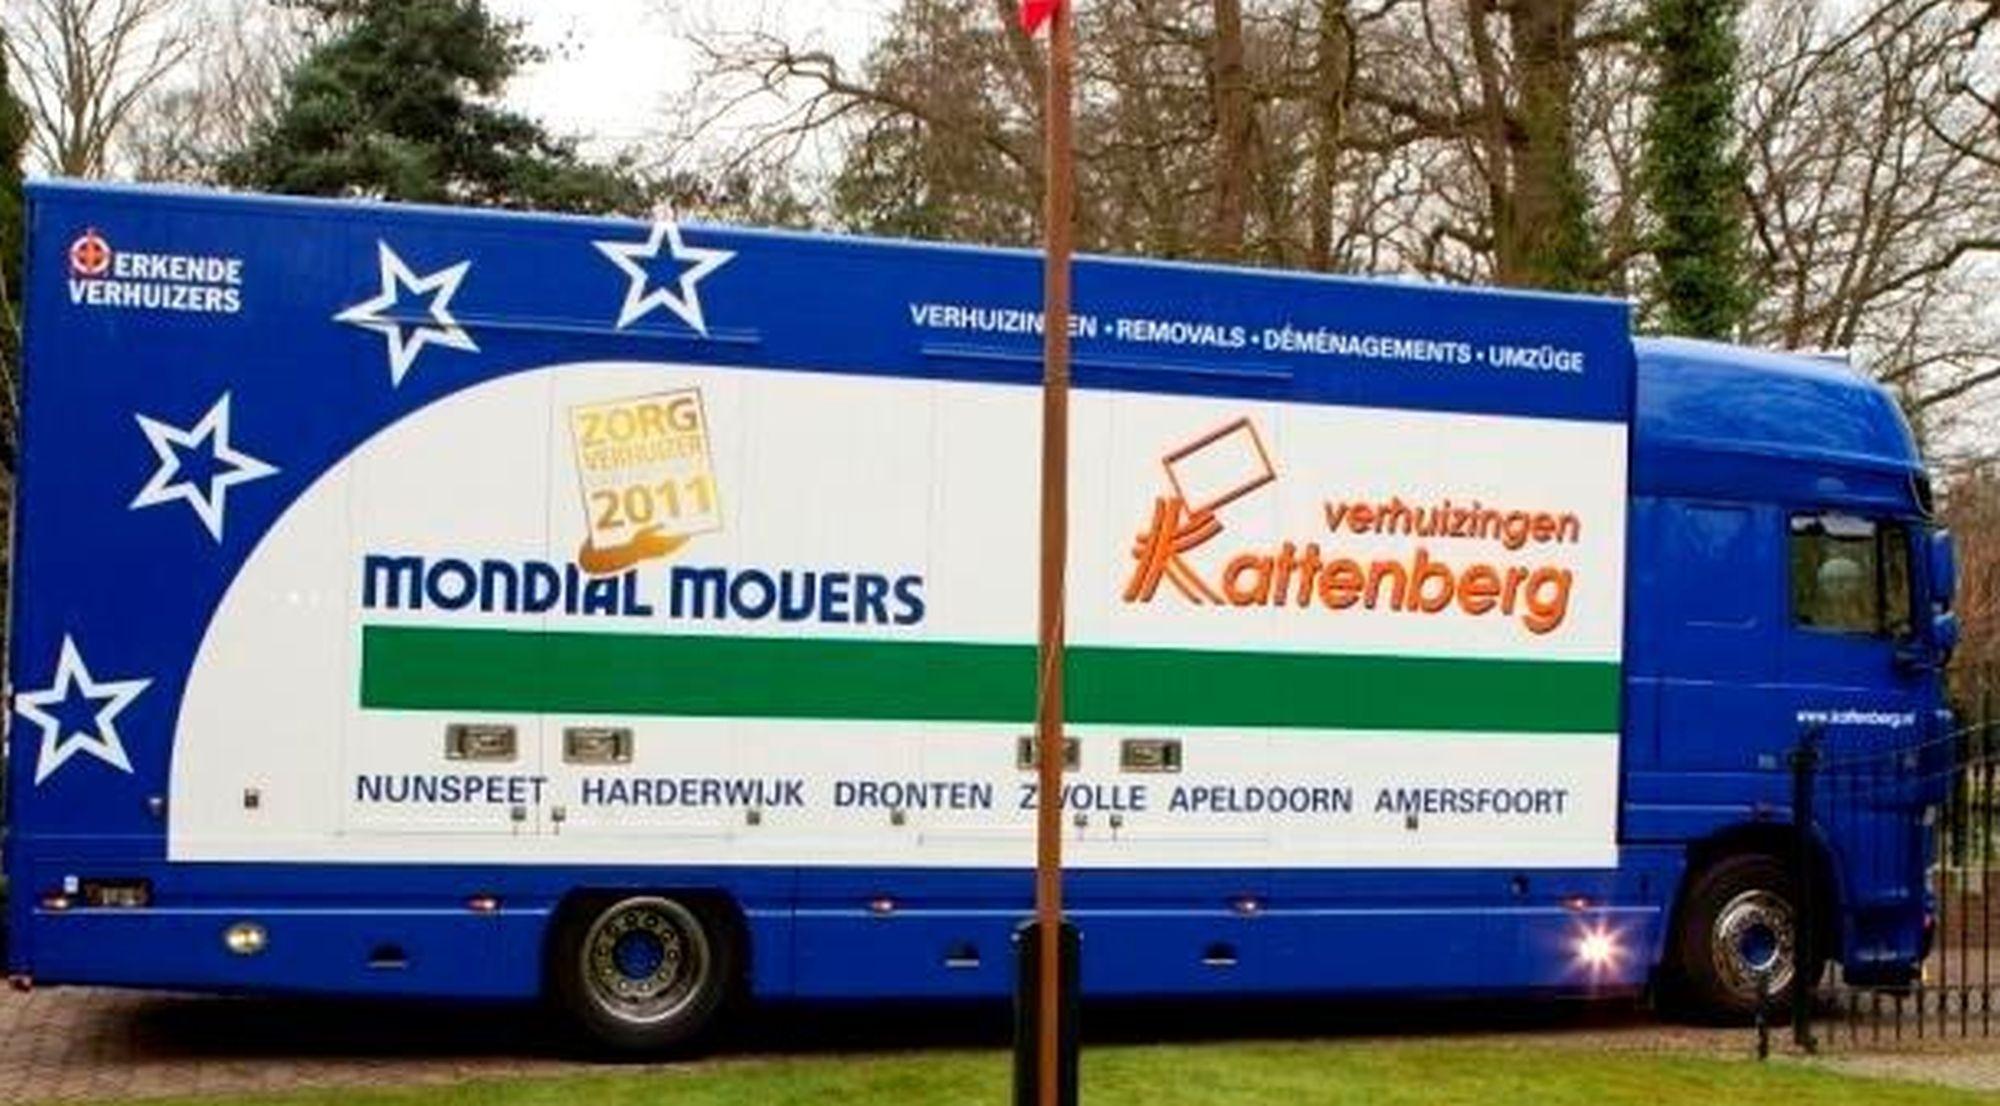 Mondial Kattenberg